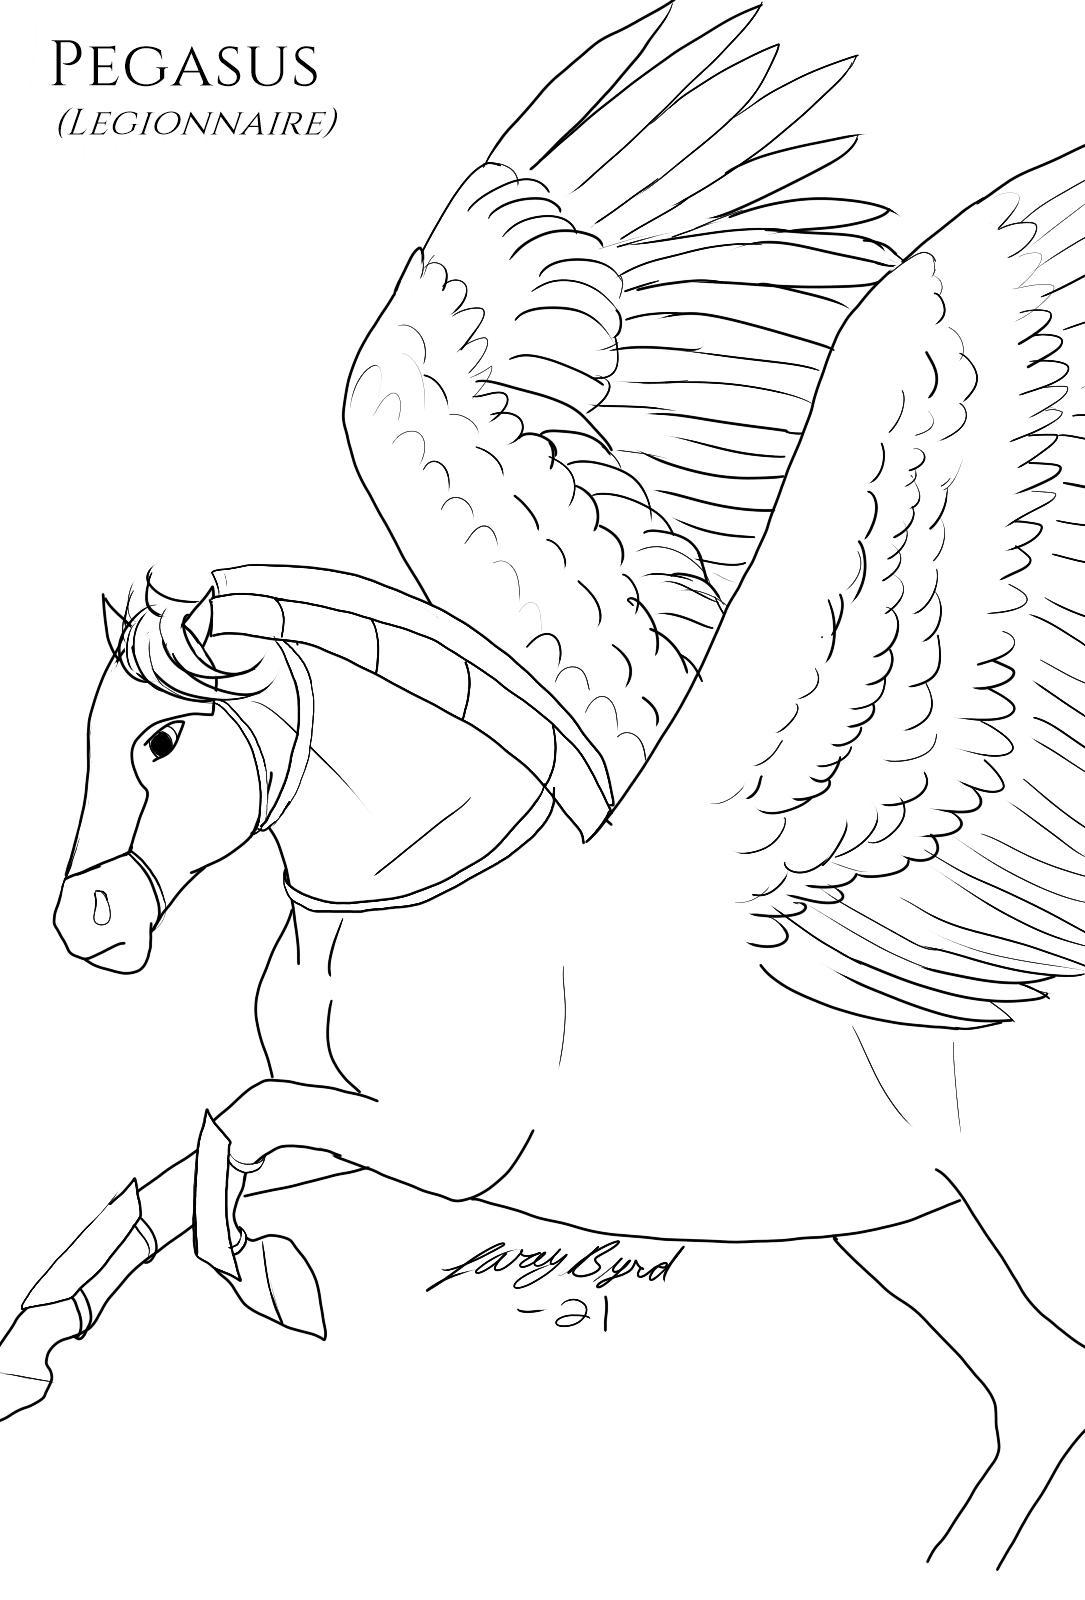 Pegasus of Tonarius